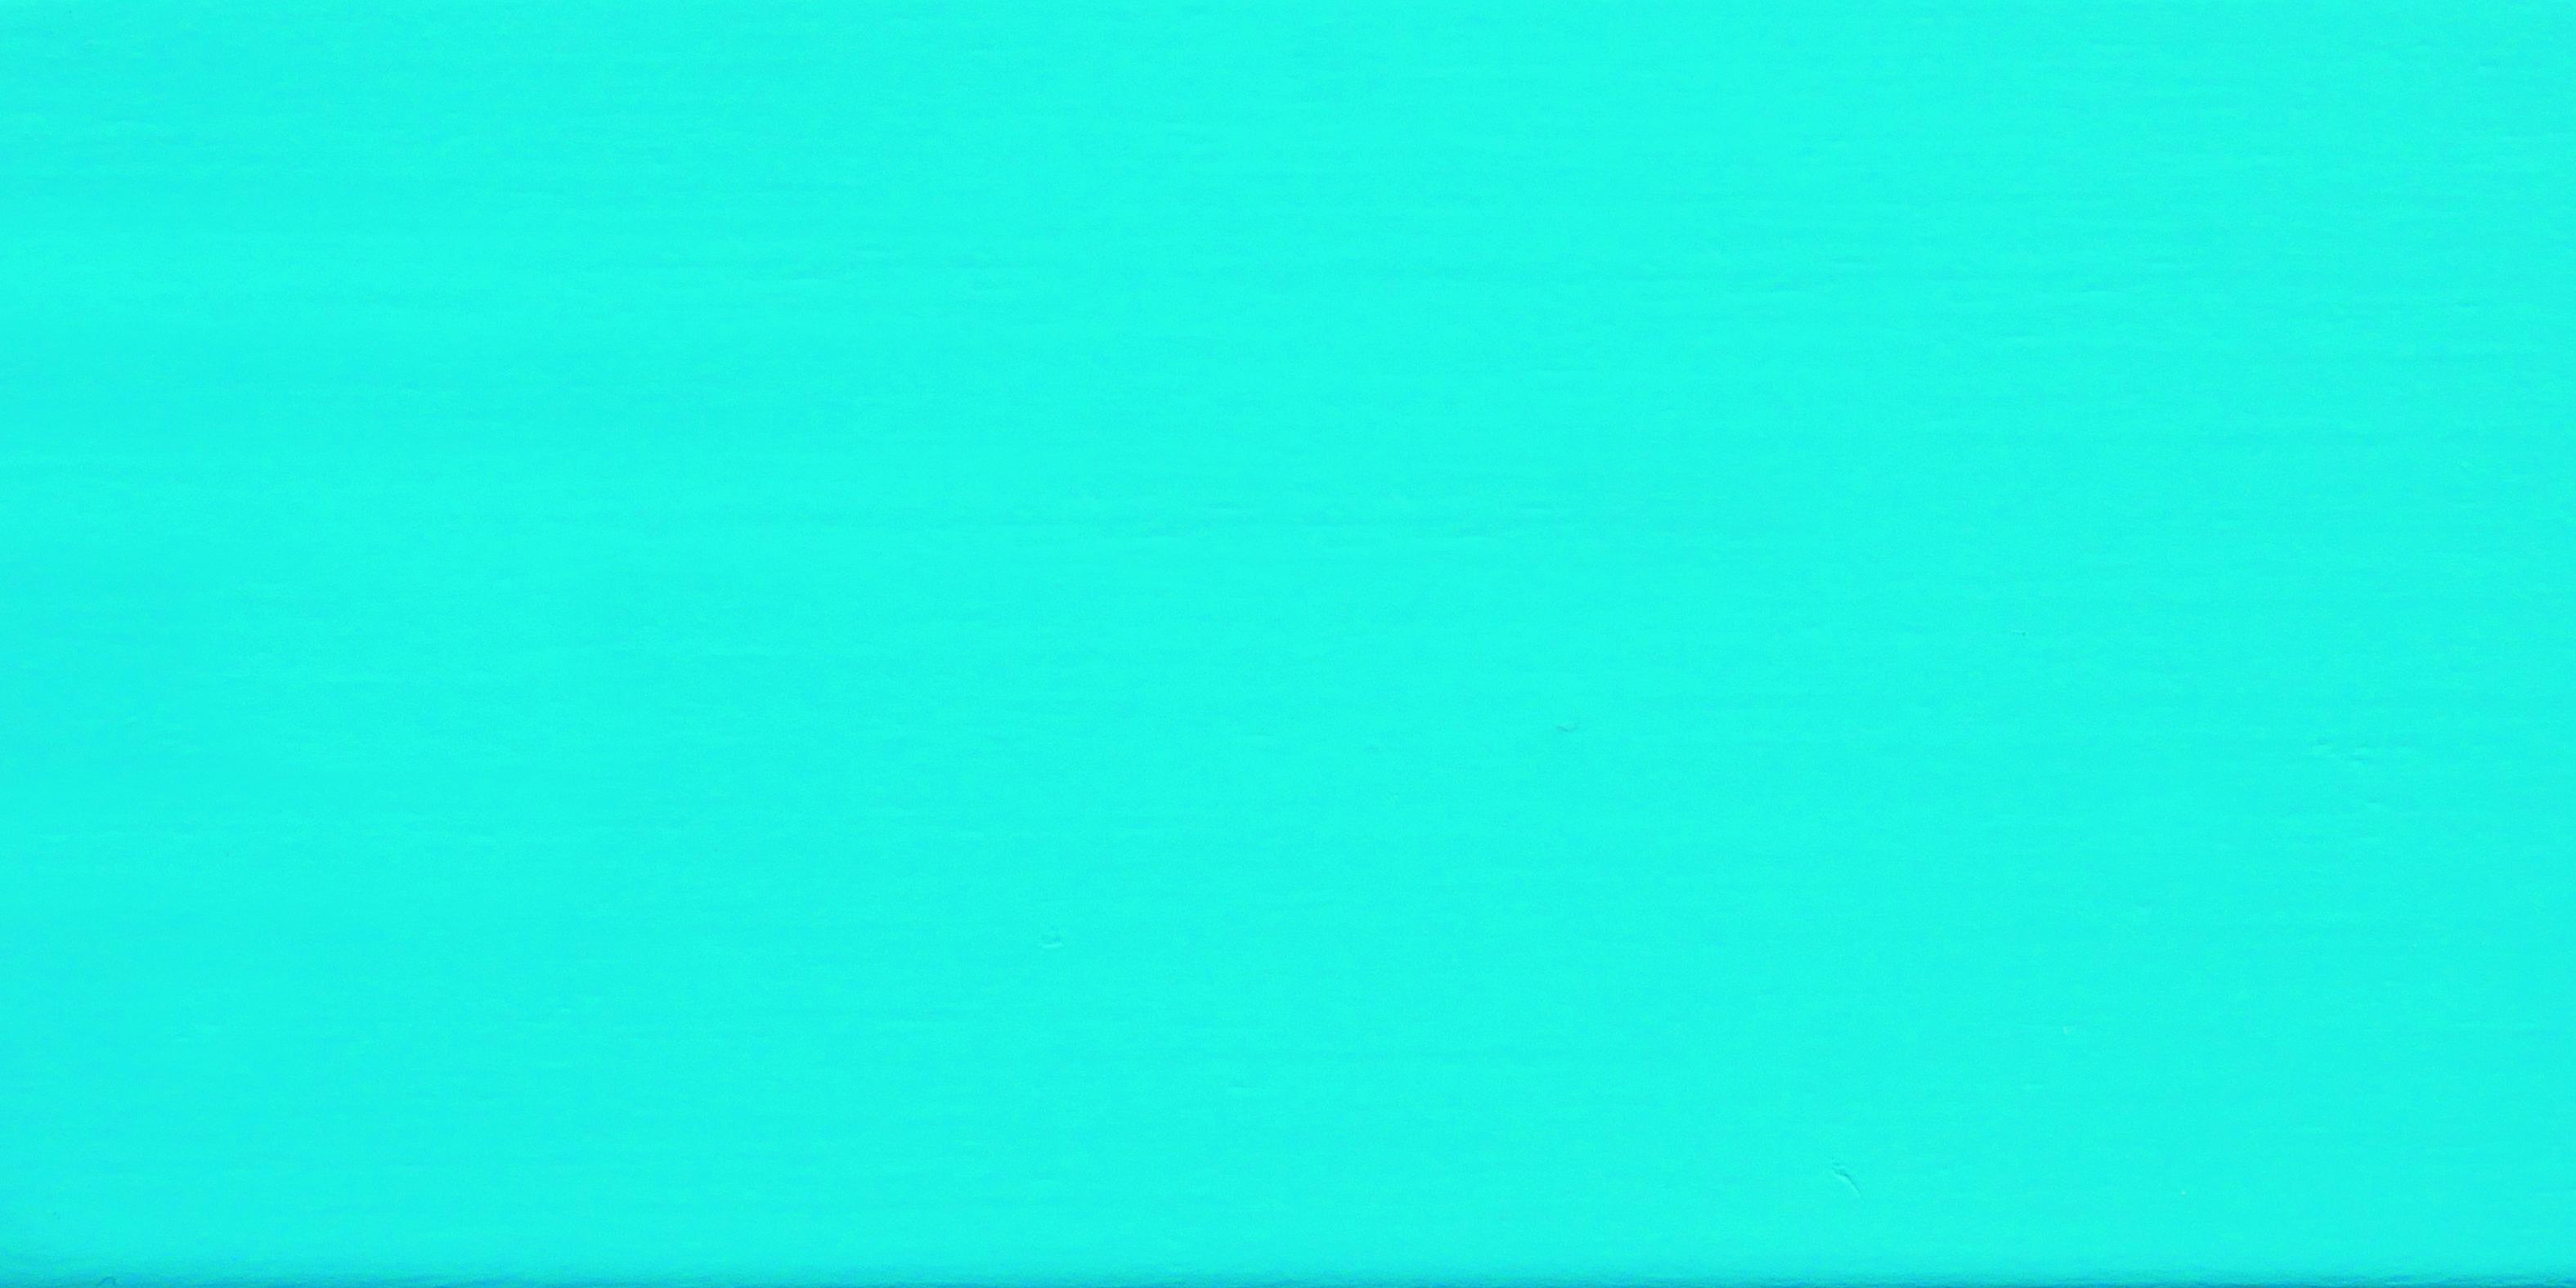 Tabelle-4-Stollen-Lack-hellblau